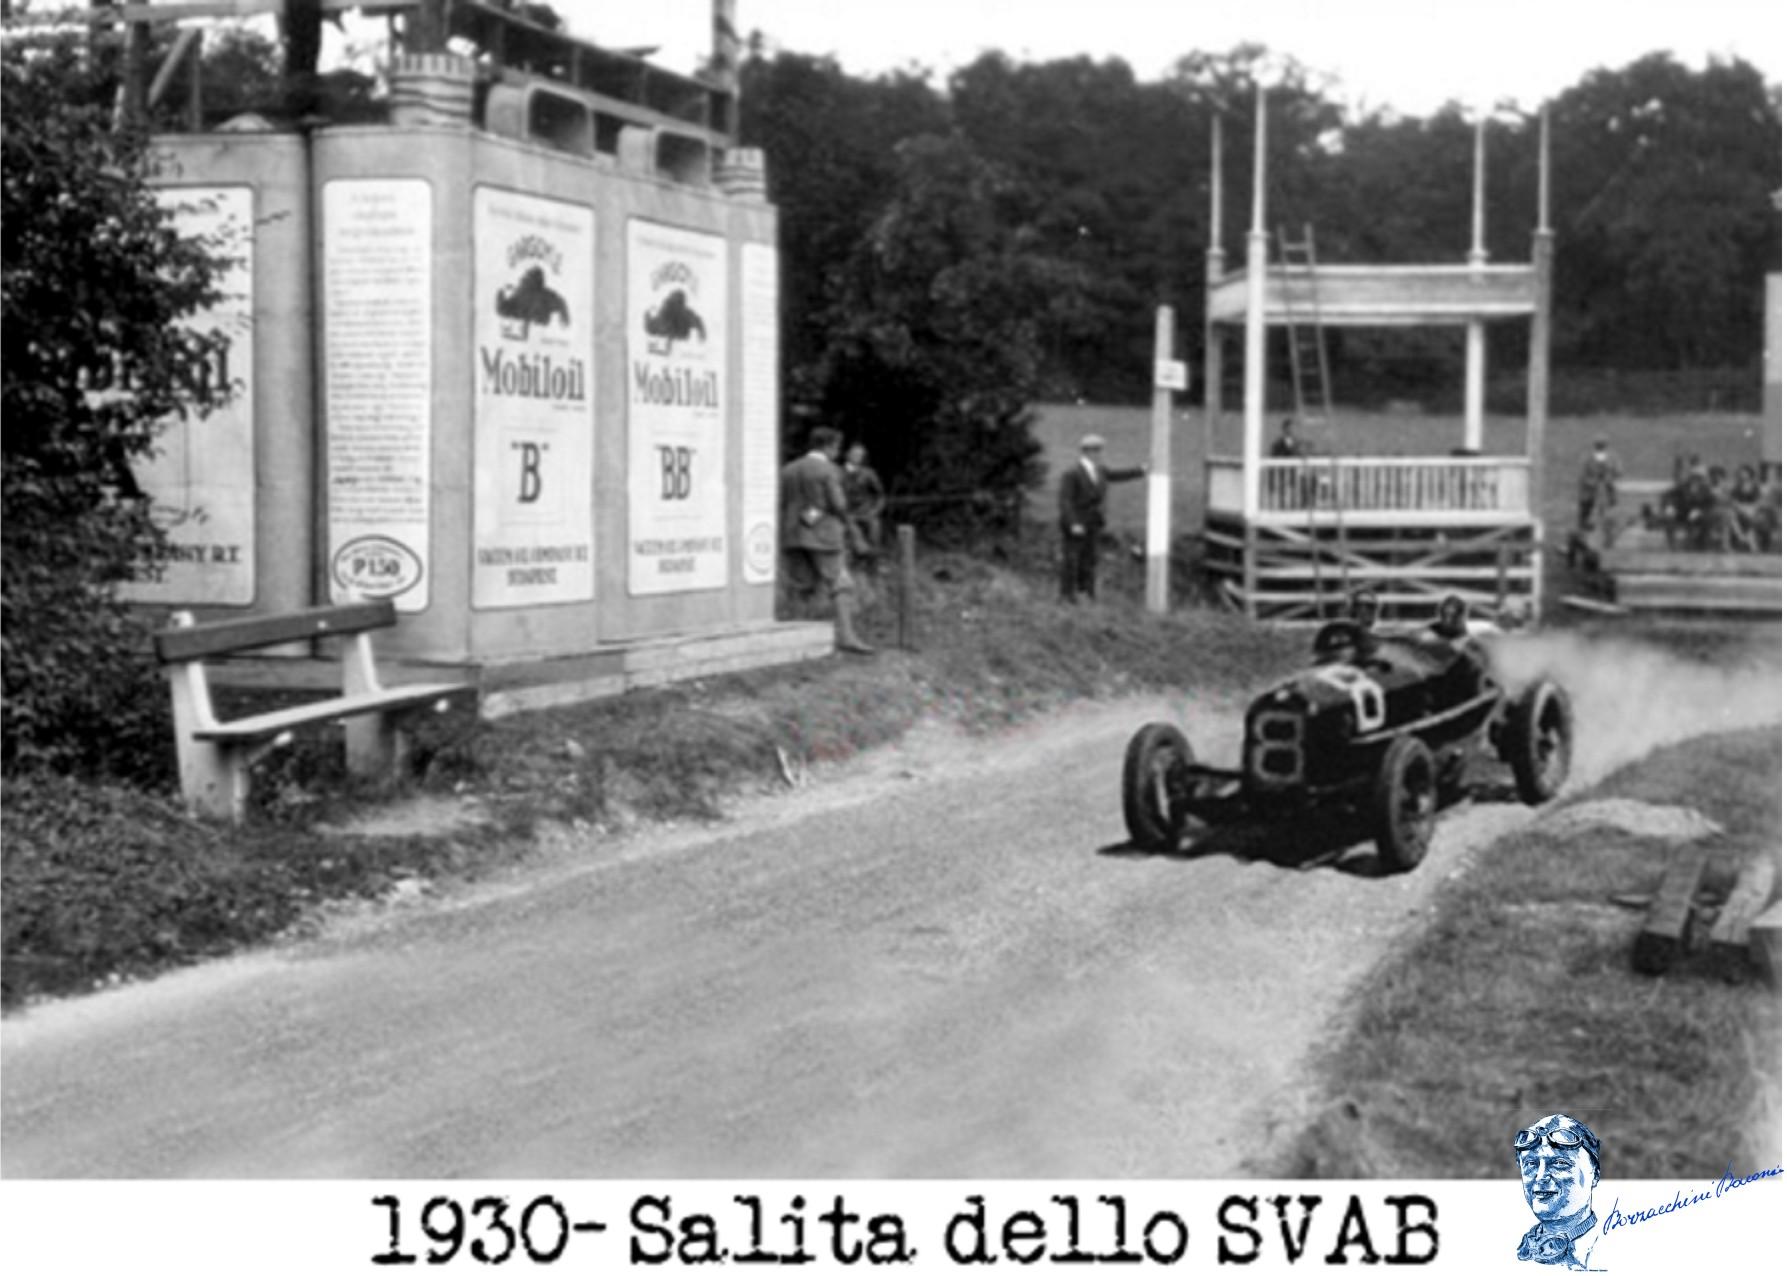 1930 salita monte svab 3